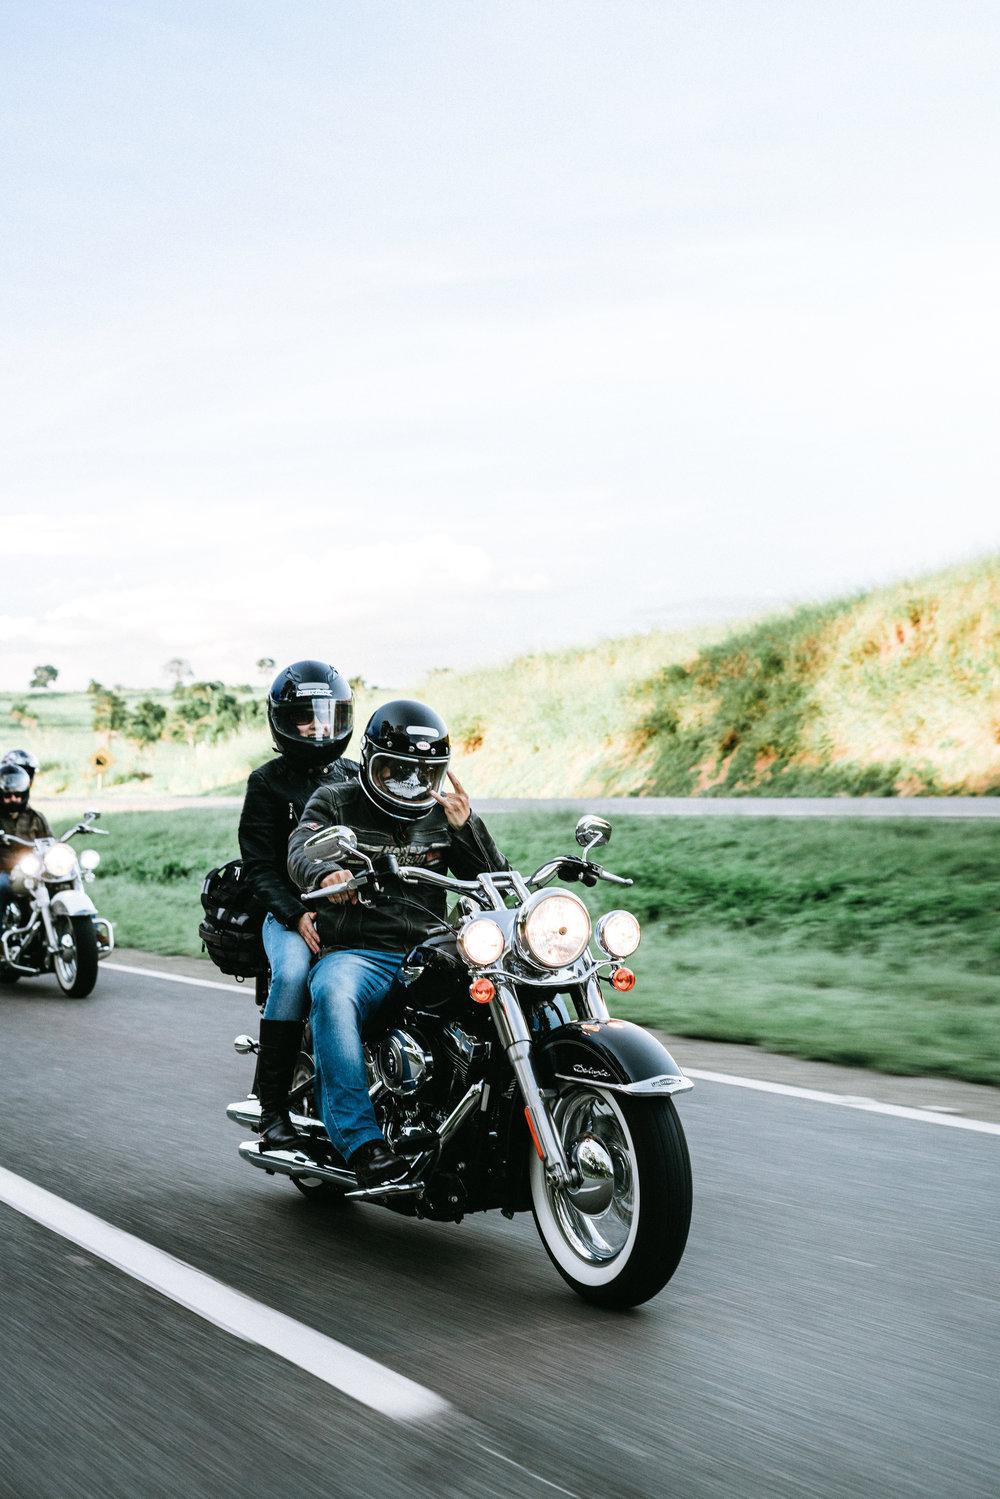 Ensaio Casal na estrada Harley Davidson Brasil - Goiania